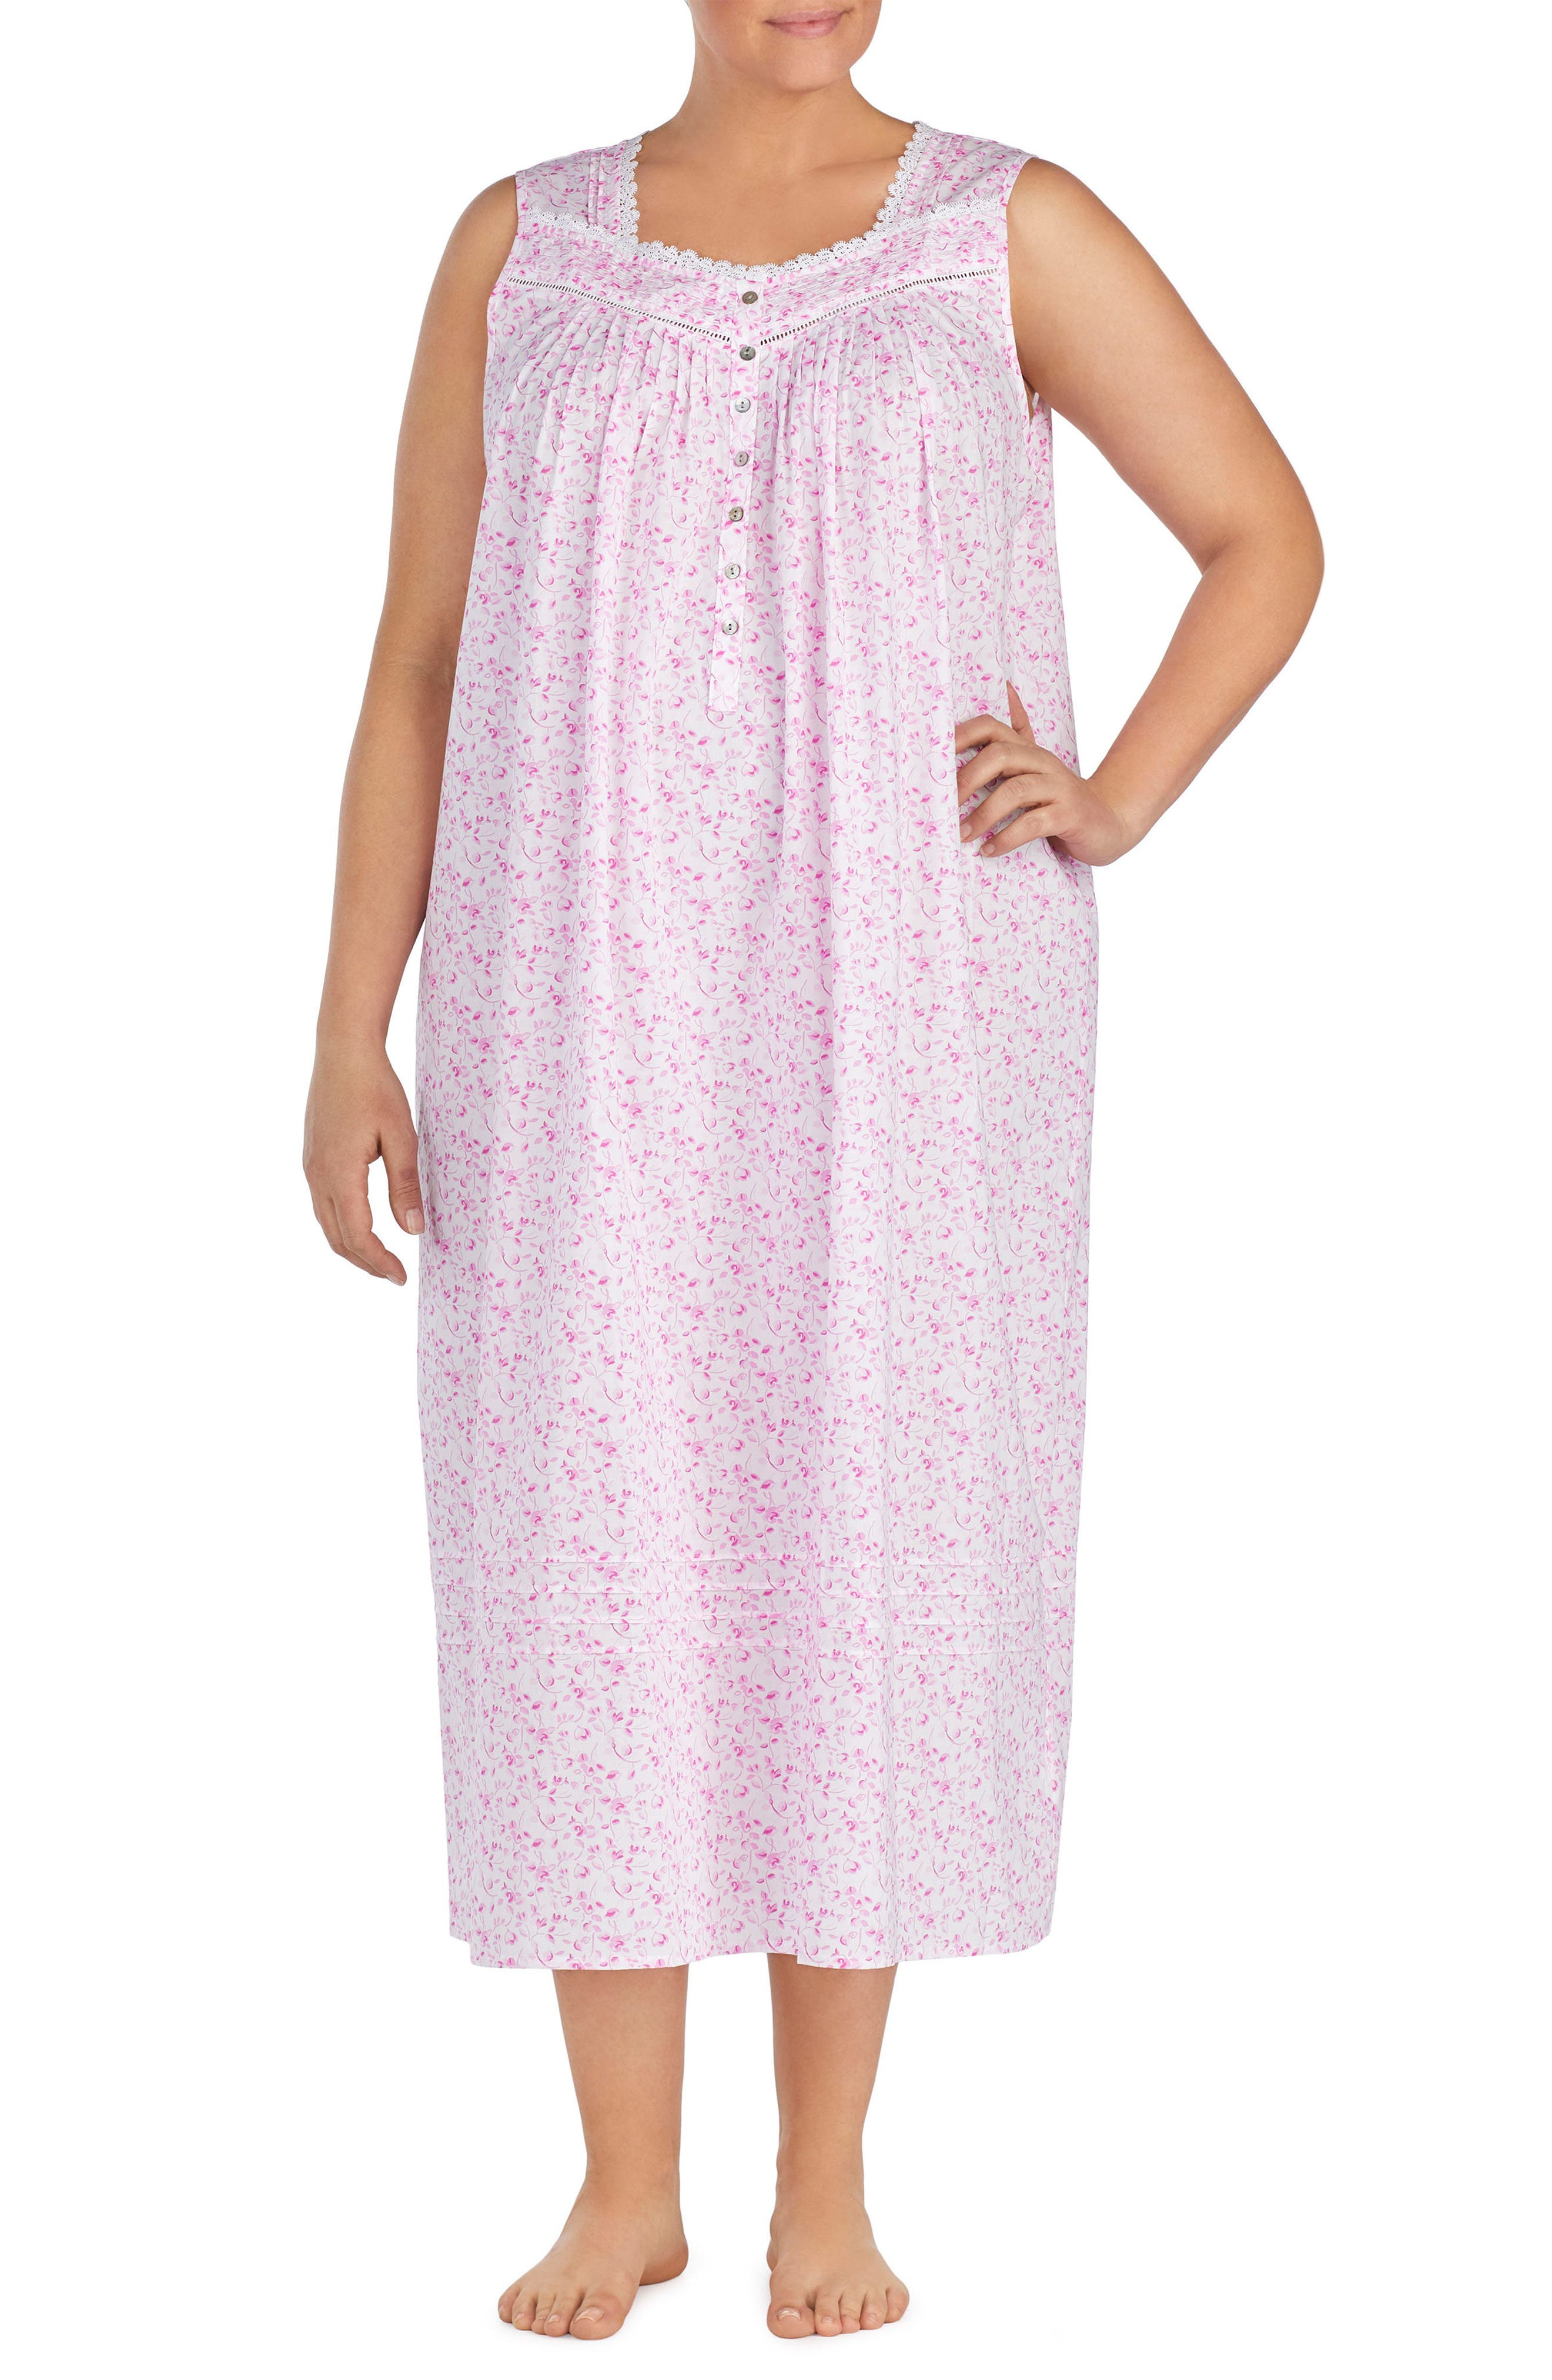 Cotton Lawn Ballet Nightgown,                             Main thumbnail 1, color,                             656